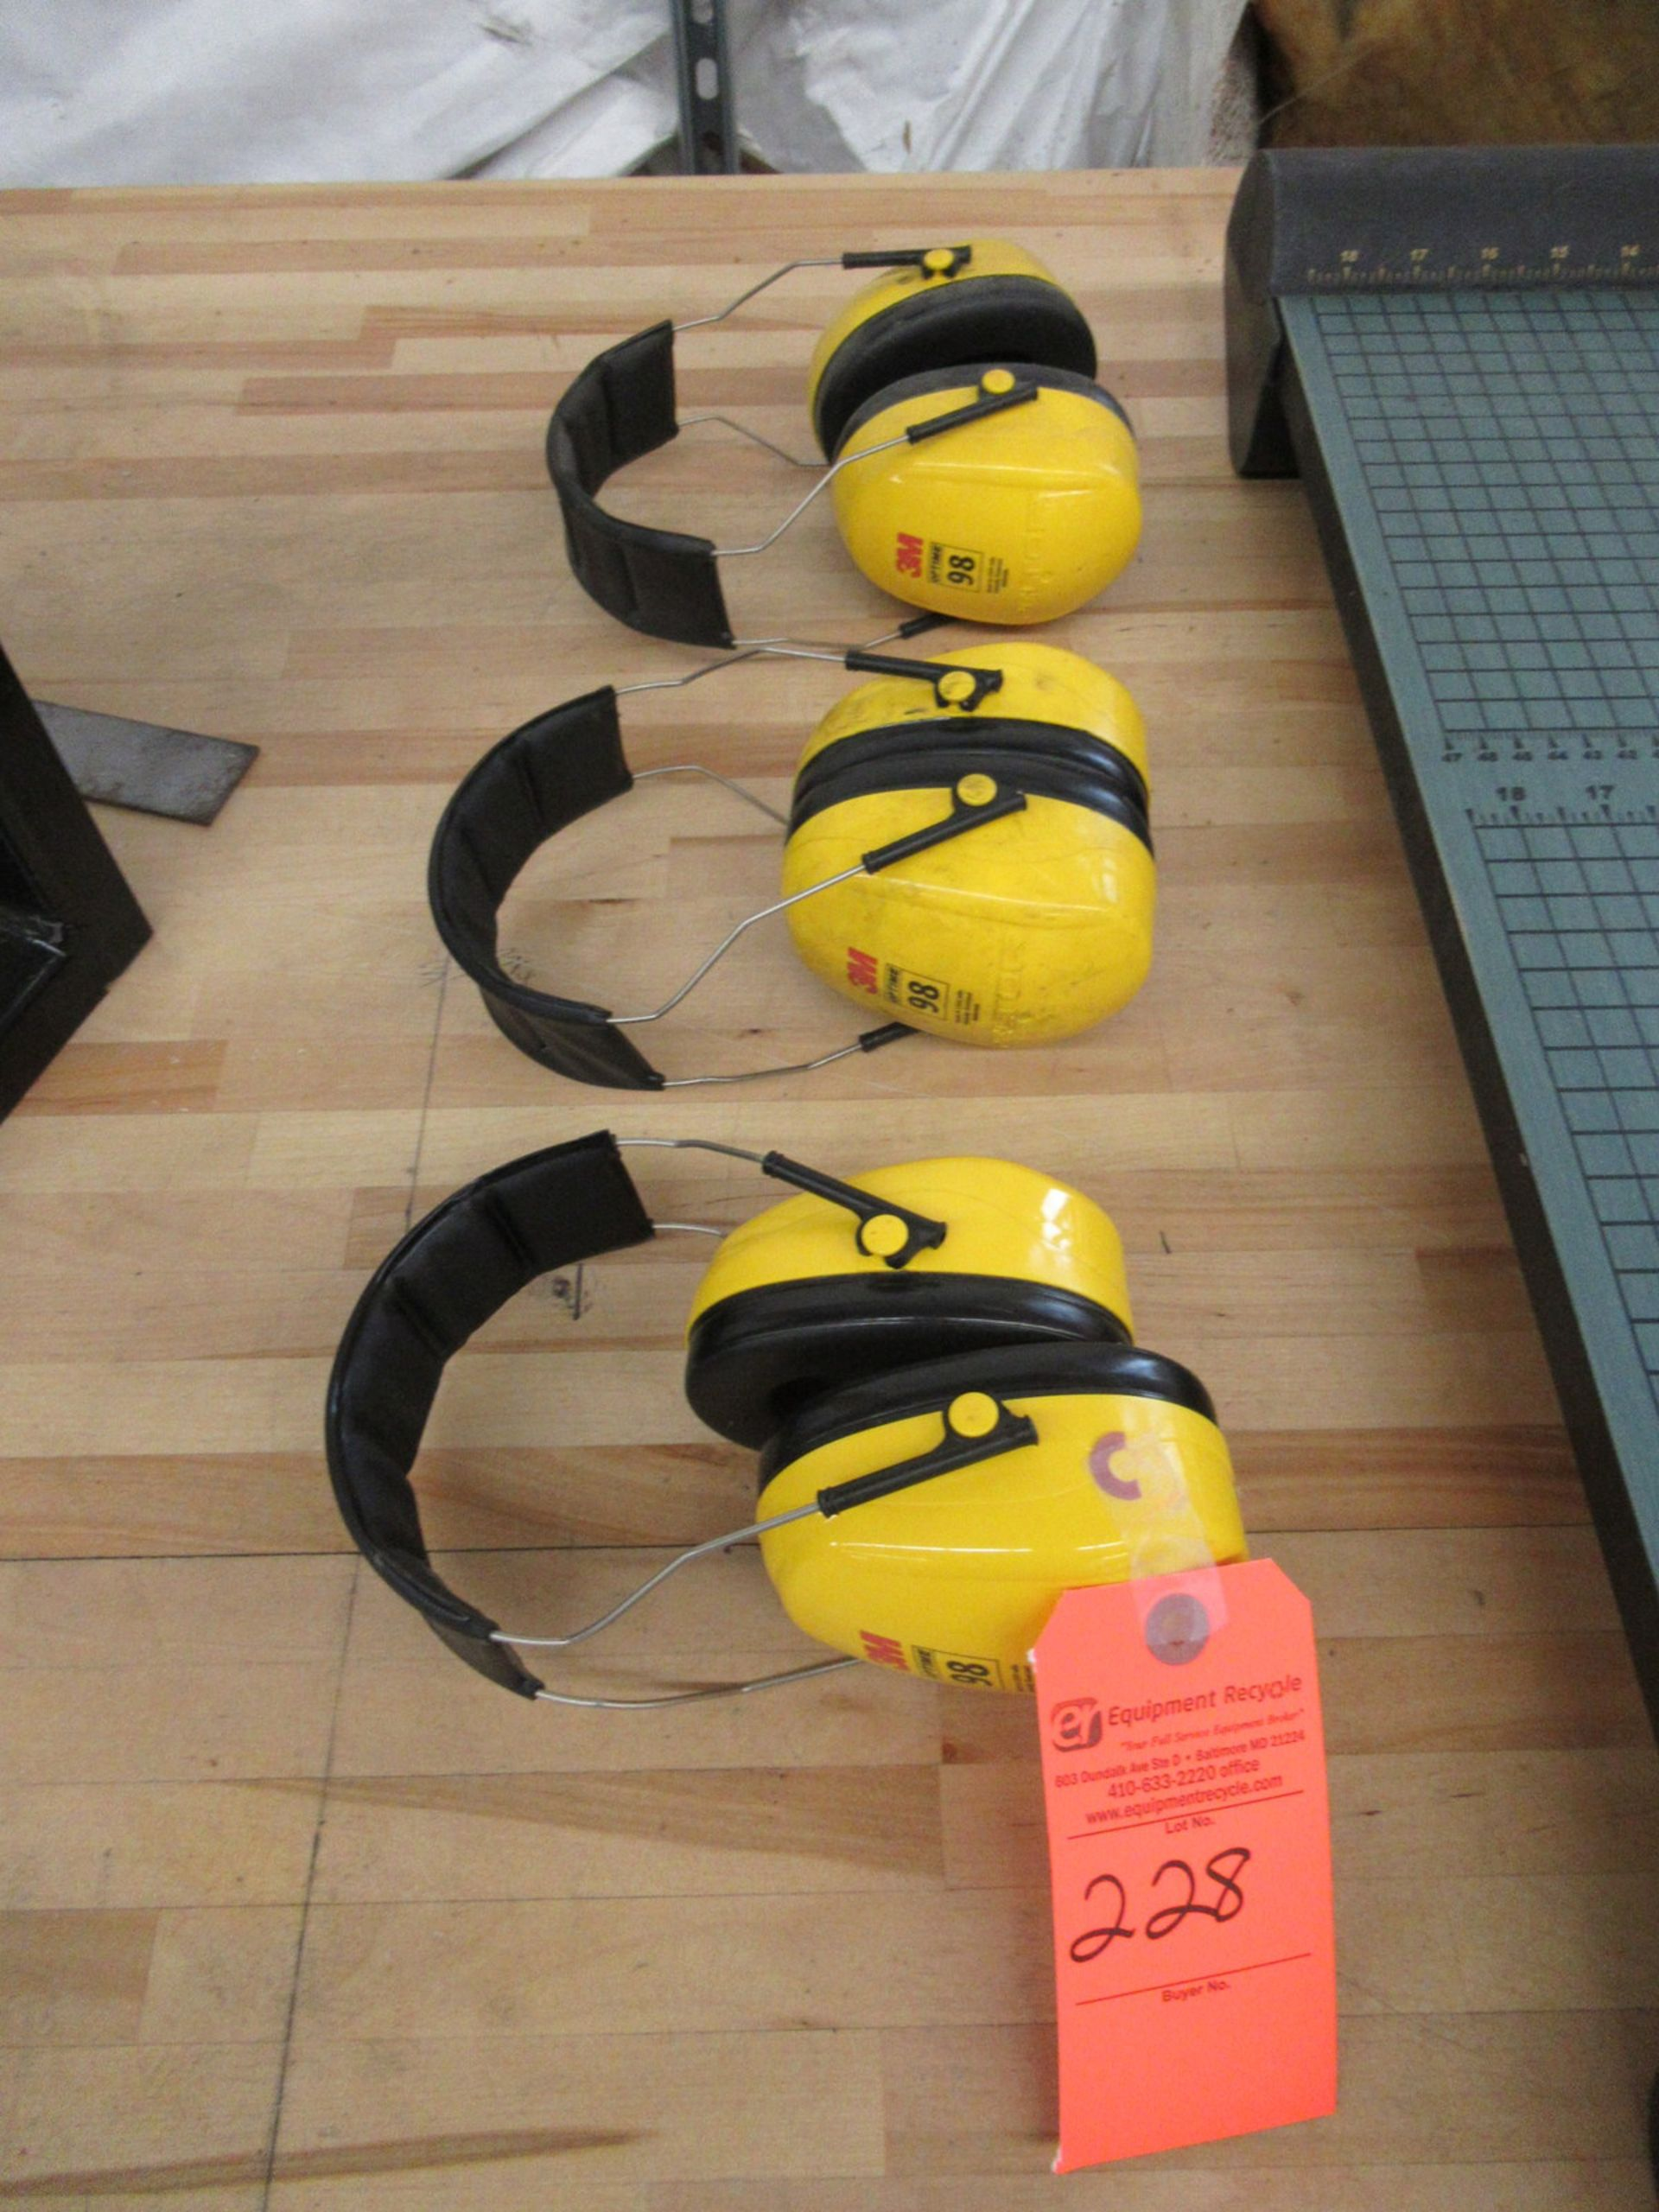 Lot 228 - Lot of 3 3M Hearing/Ear Protection Earmuffs